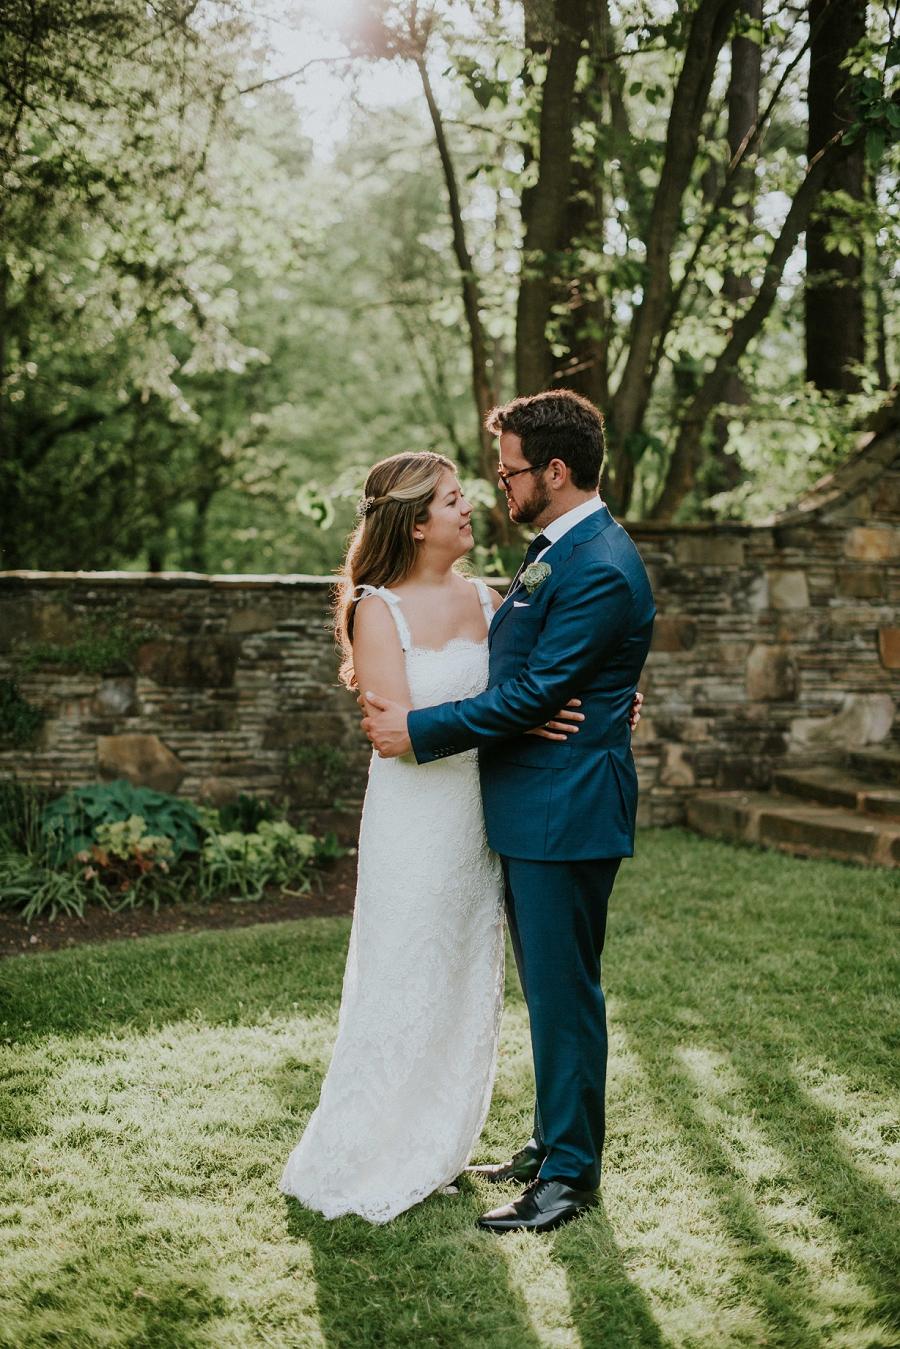 HillbrookClub_Wedding_Cleveland_Jessica+Dani_M+JPhoto-838.JPG